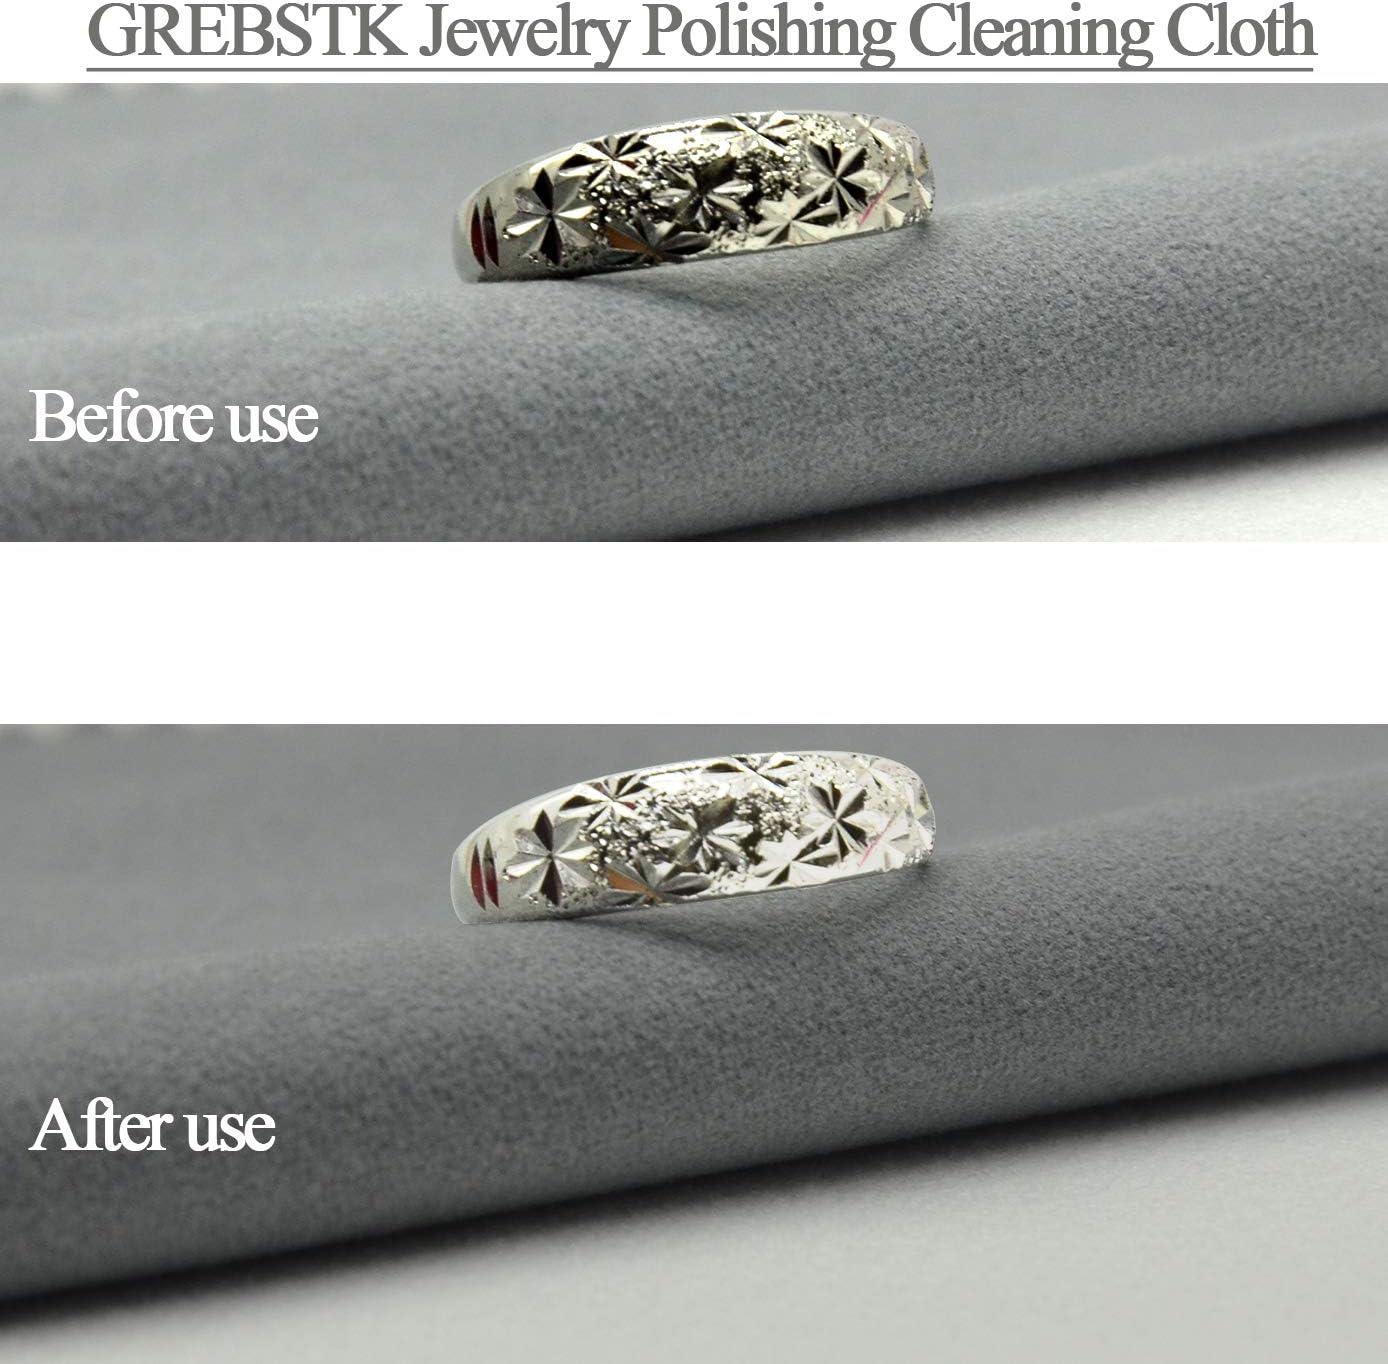 Platinum Tarnish Remover Keep Jewelry Shining Coins and etc 12x 10 Diamand Jewelry Polishing Cleaning Cloth Polishing Cleaner Cloth 100/% Cotton for Gold Watches Silver Precious Stones